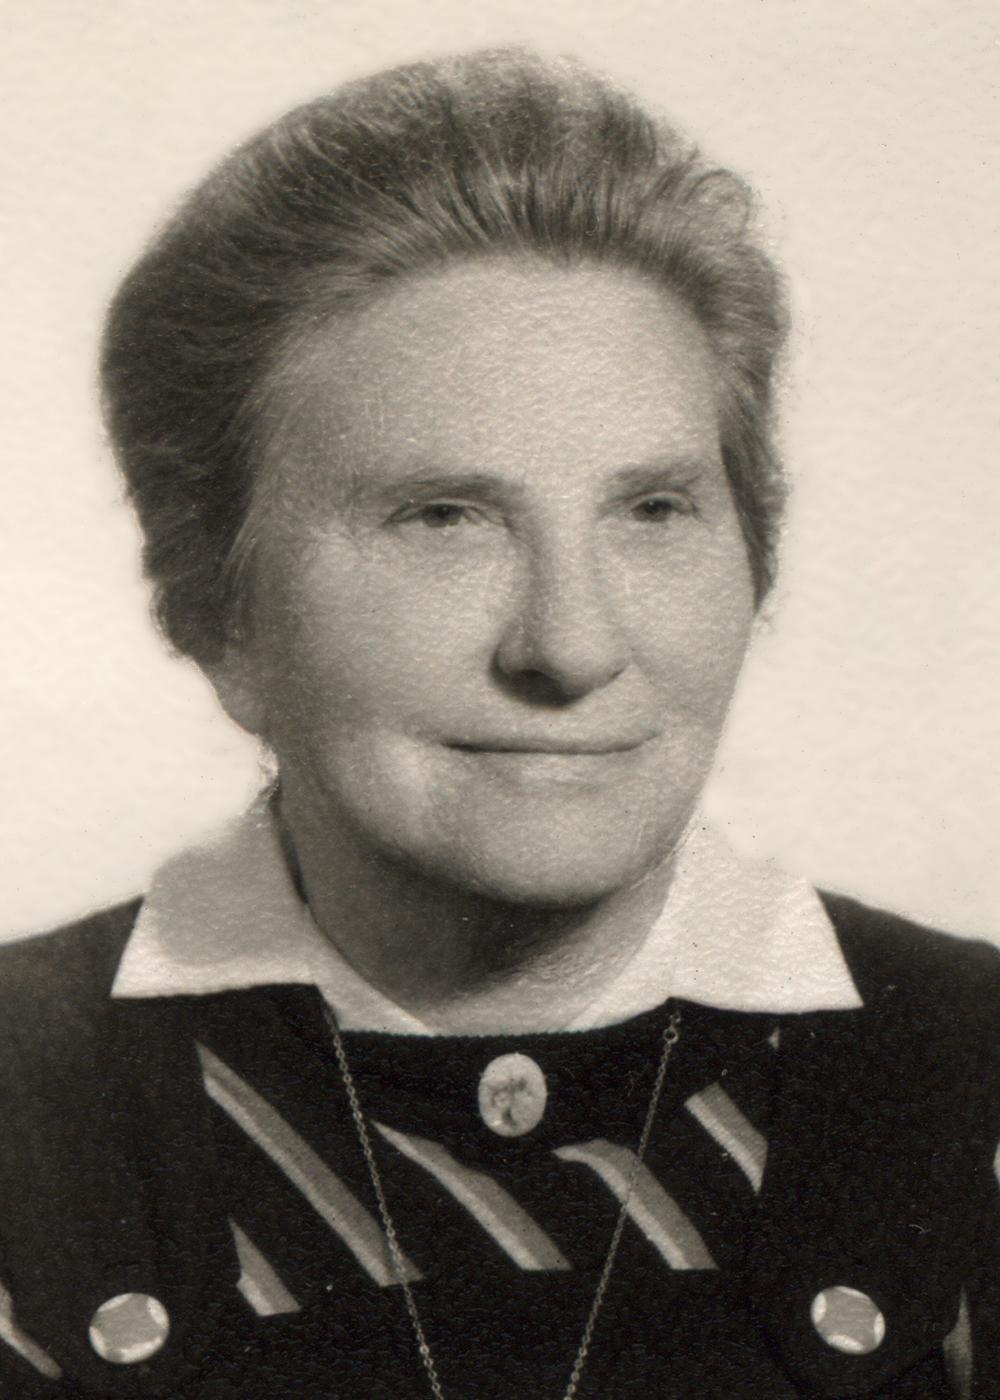 Luis' mother, Matilde Balfour de Palau.